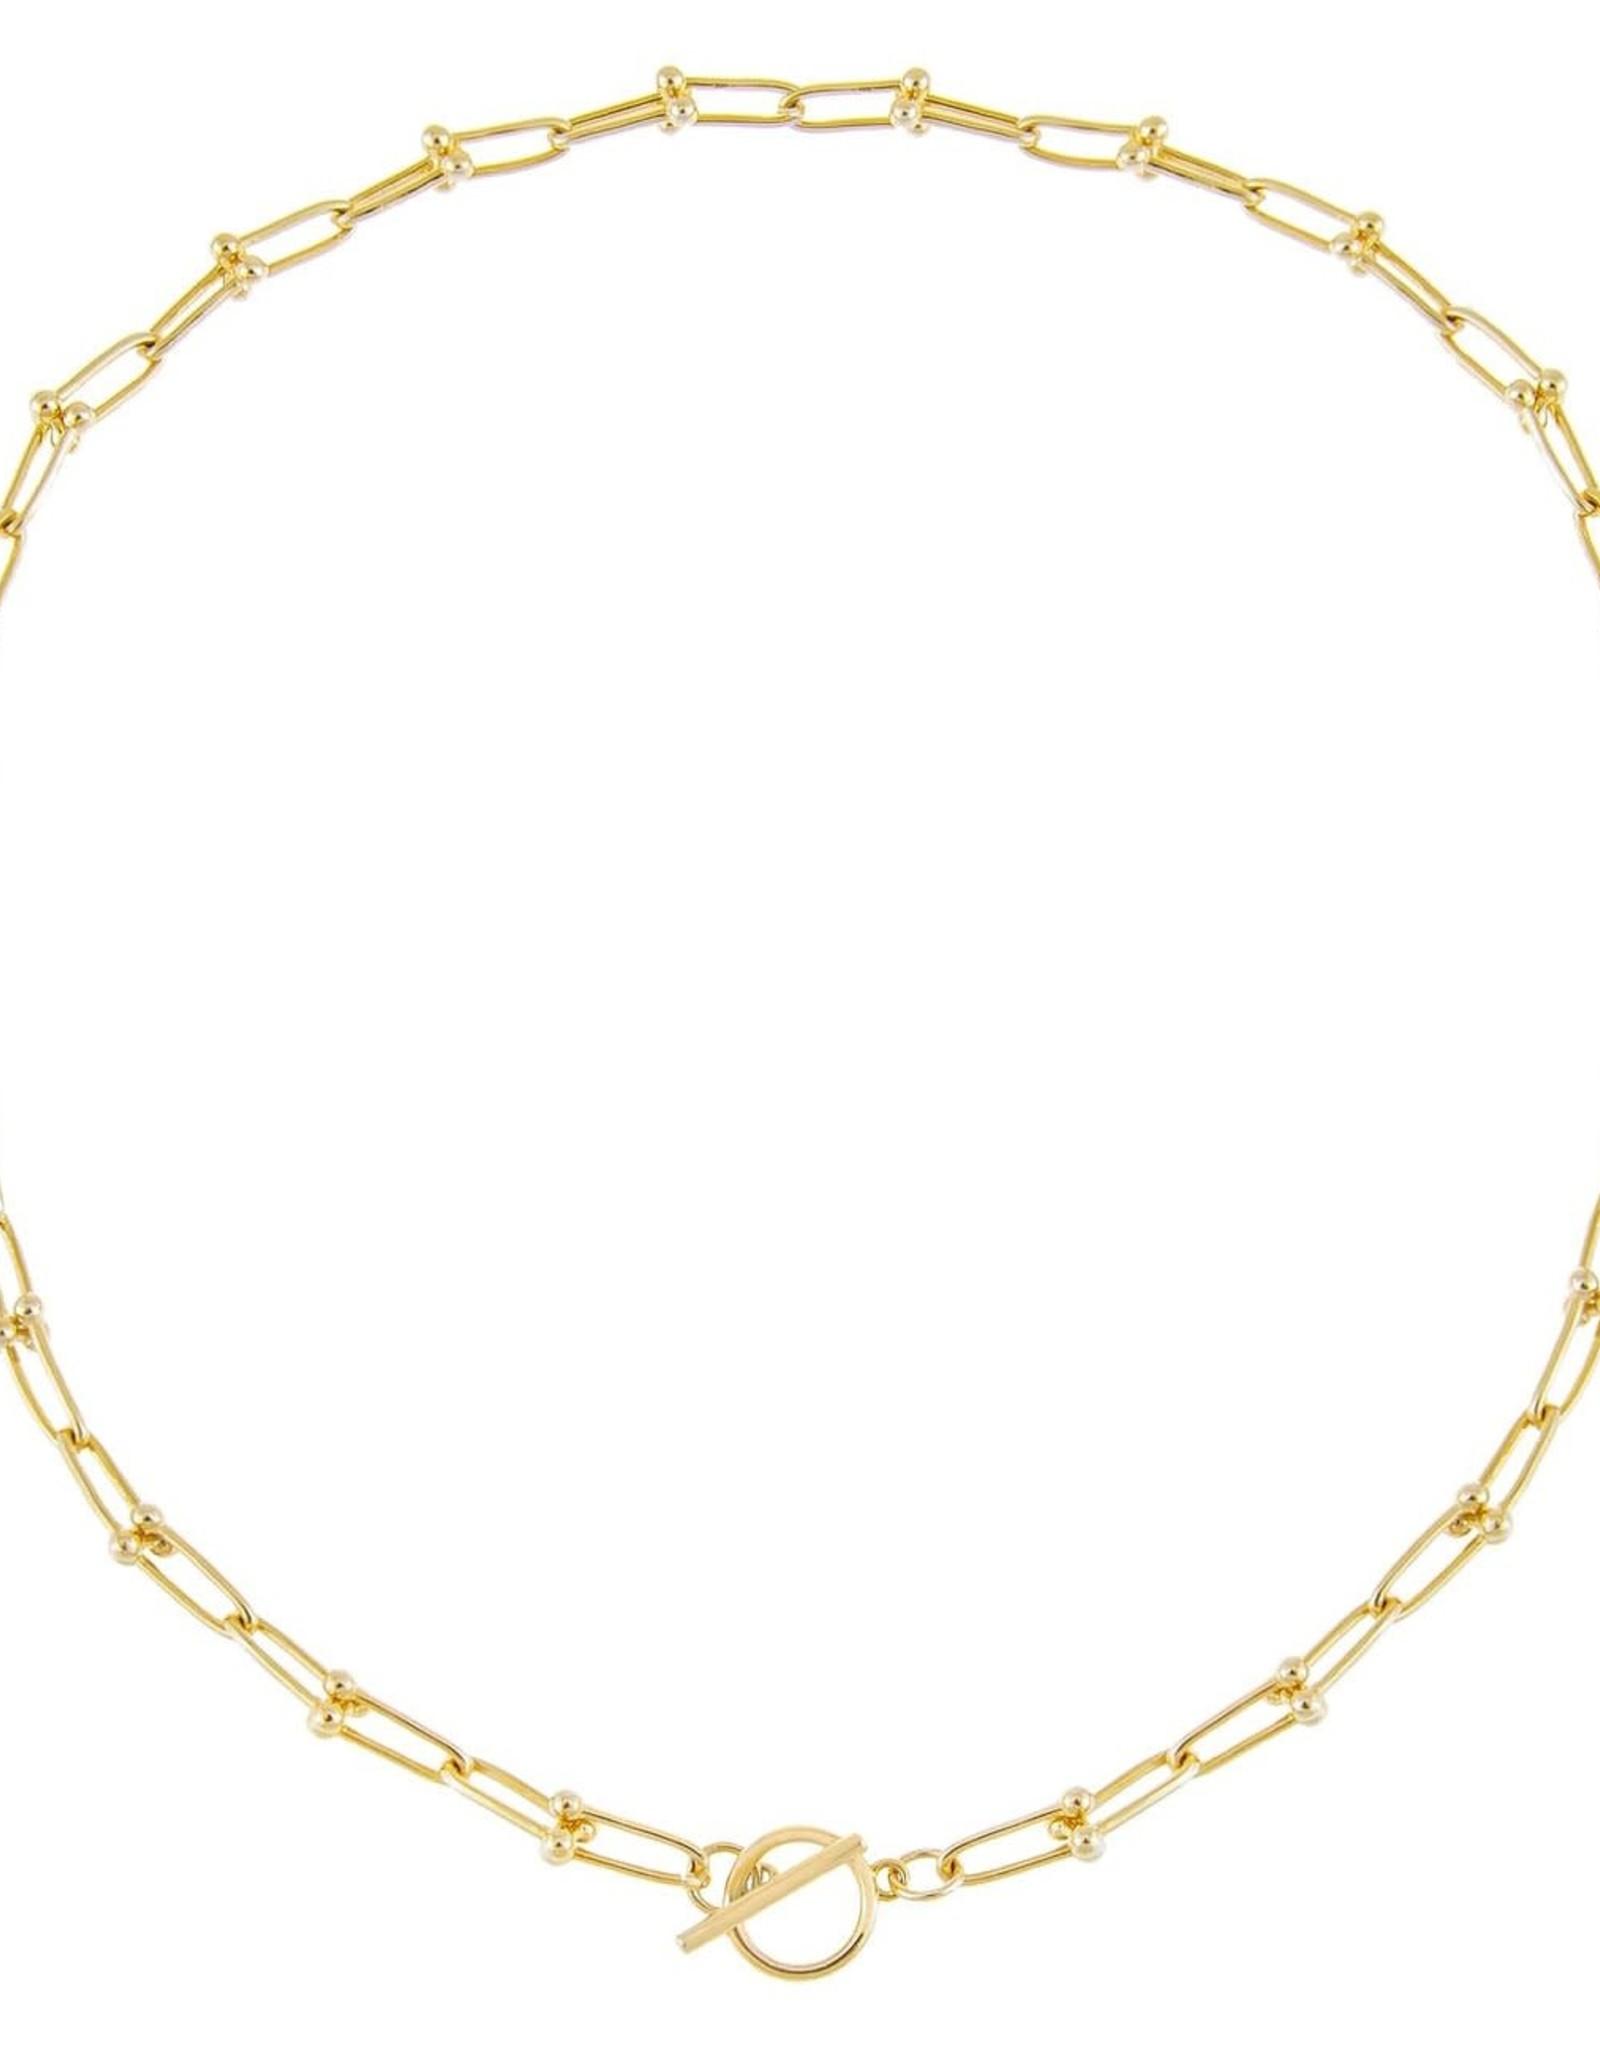 Adinas U Chain Toggle Necklace